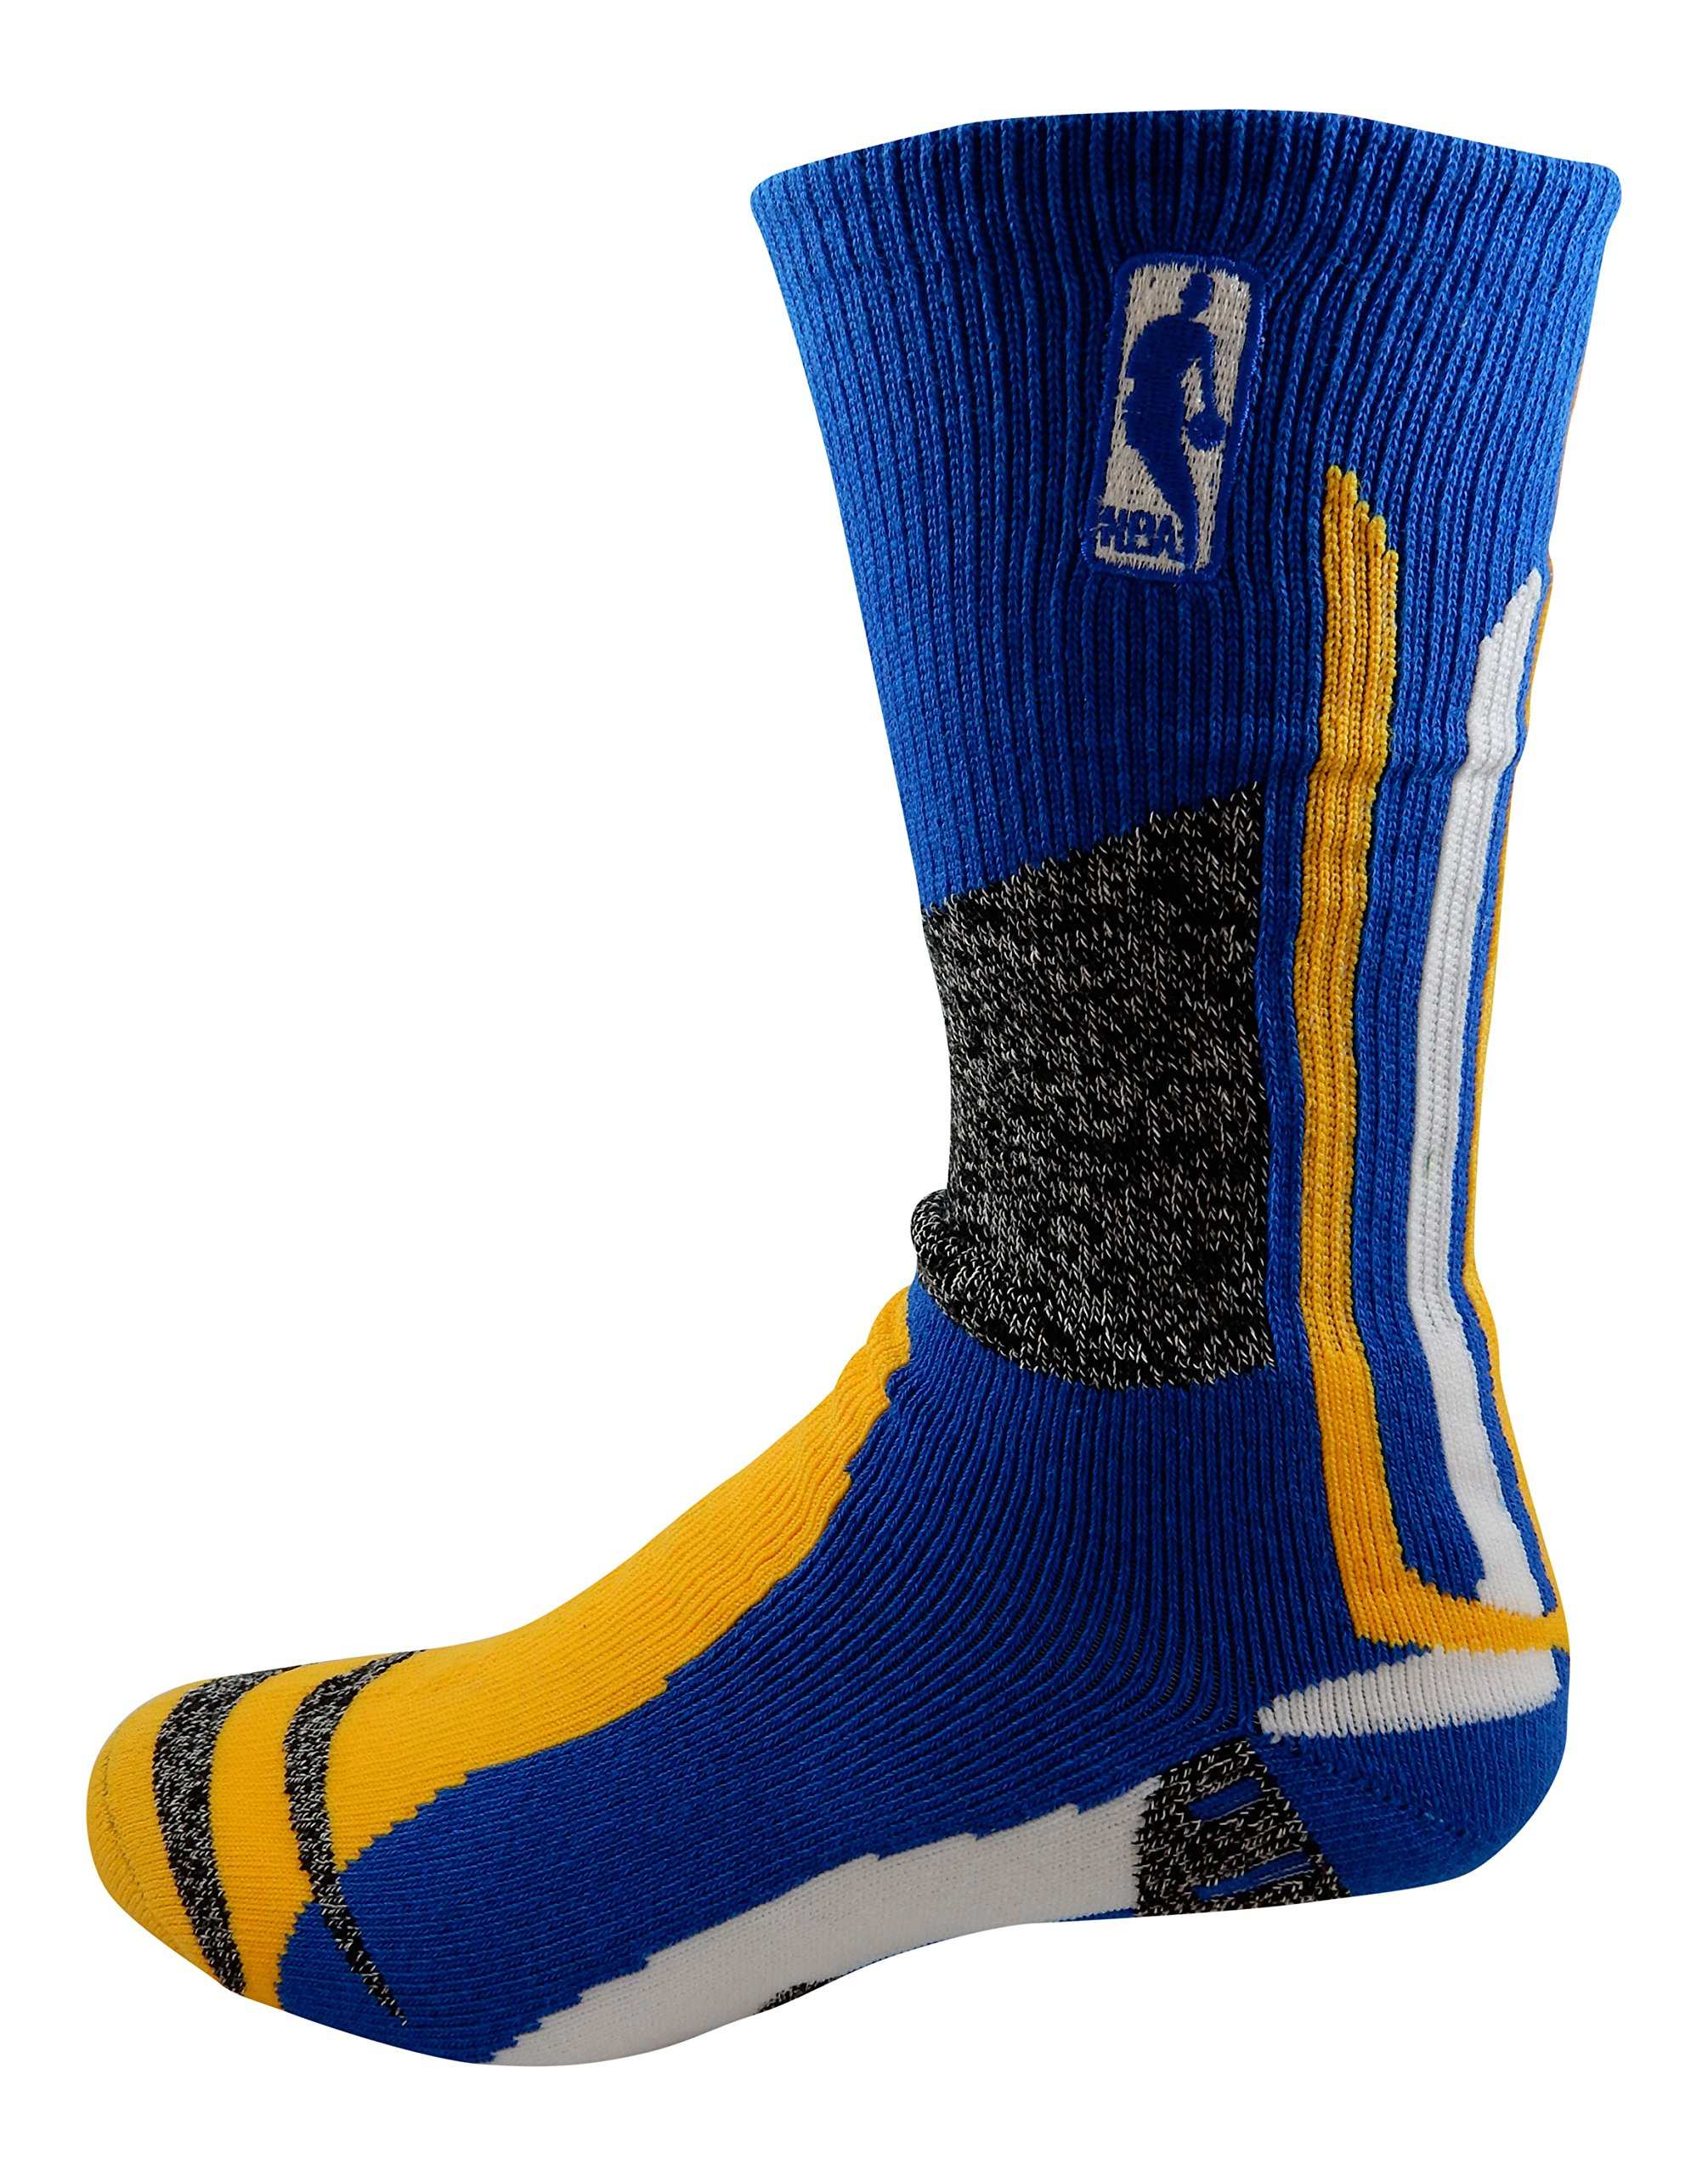 NBA Logoman Royal Yellow White Crew Socks (Medium & Large Available) (Large 10-13)